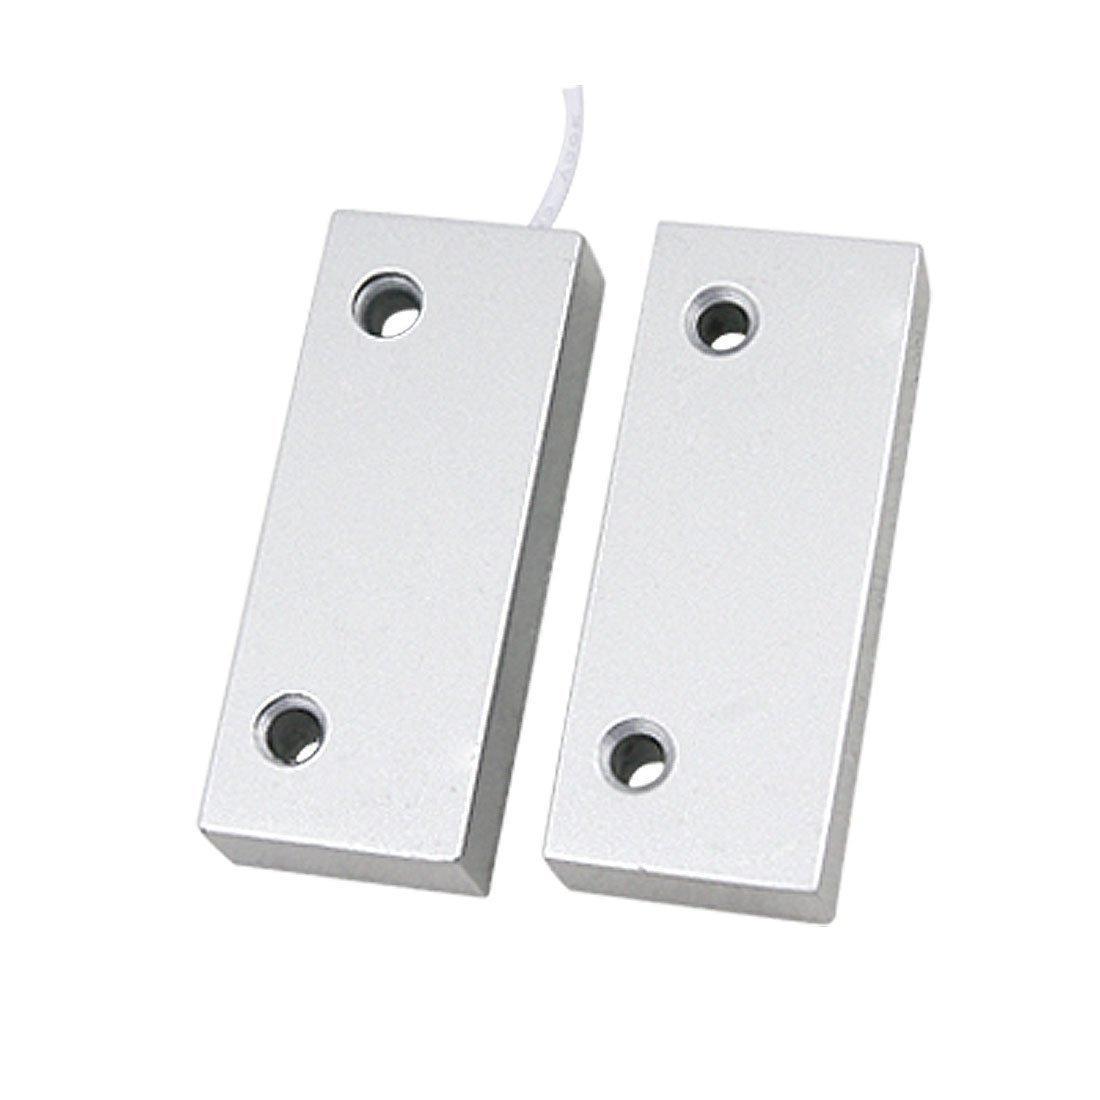 Safearmed® OC-52 Verdrahteter Türfenstersensor Sicherheitsalarm Türfensterkontakte Magnetschalter